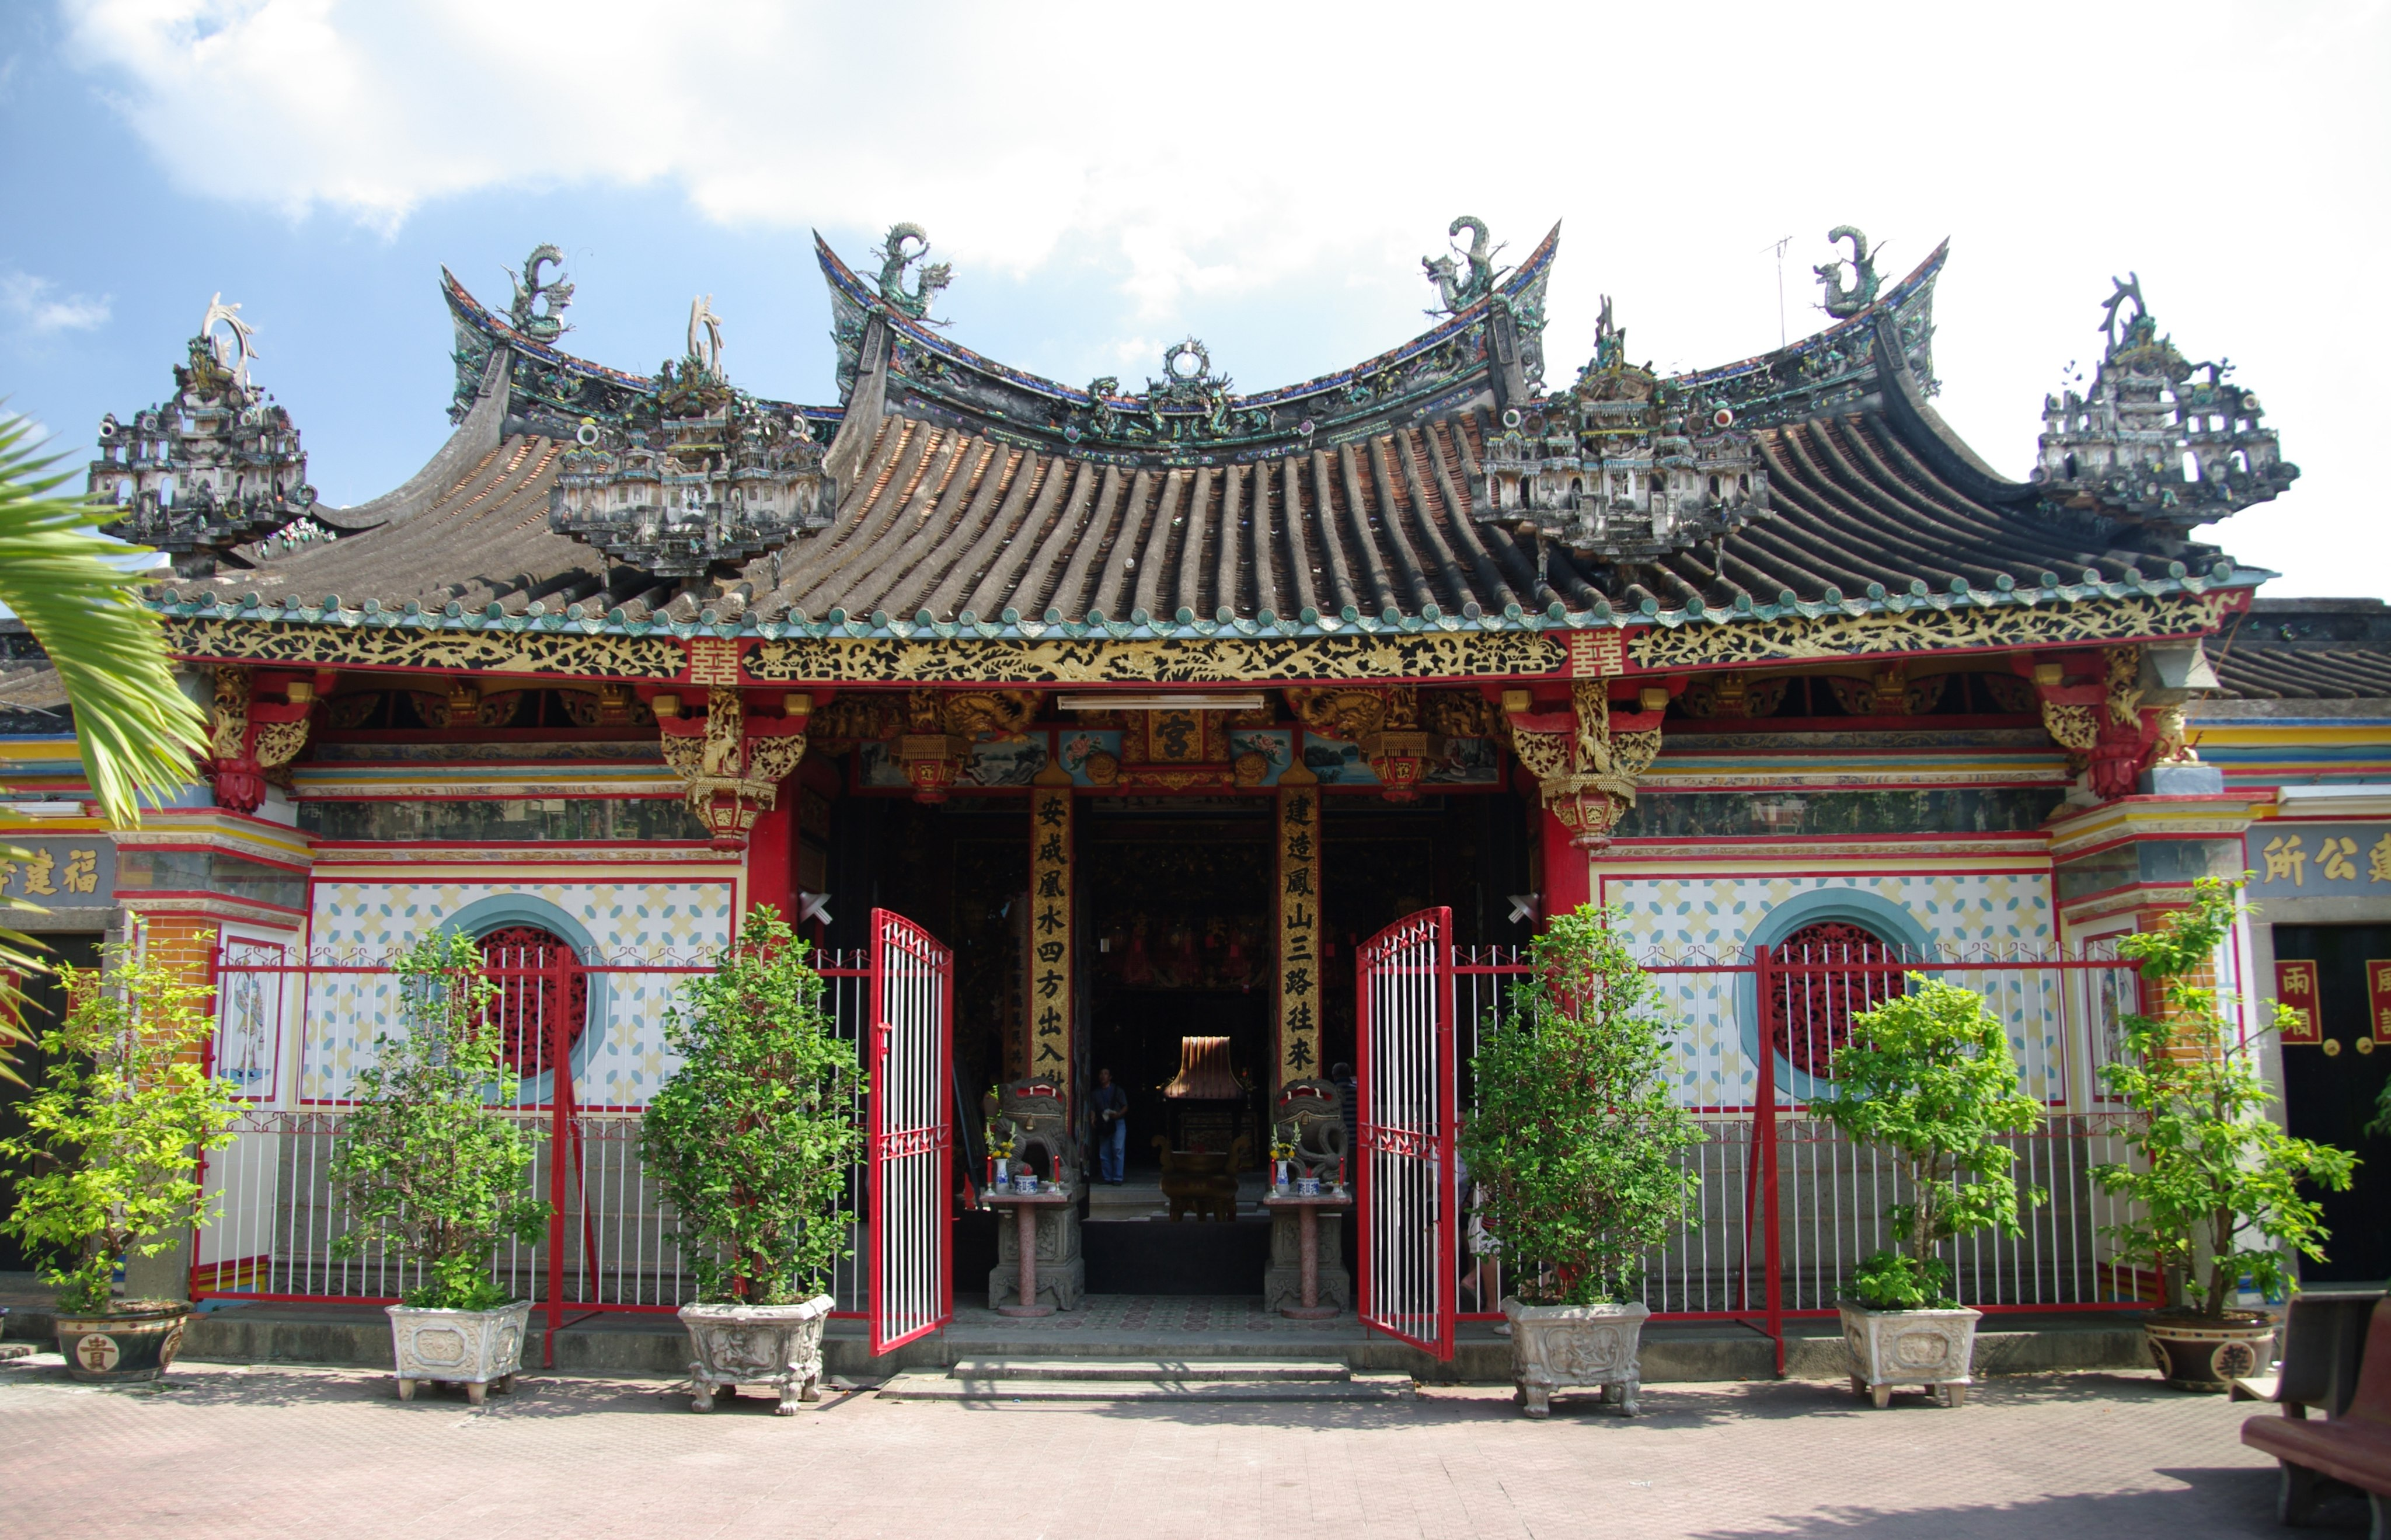 Front building view of fChùa Kiến An Cung